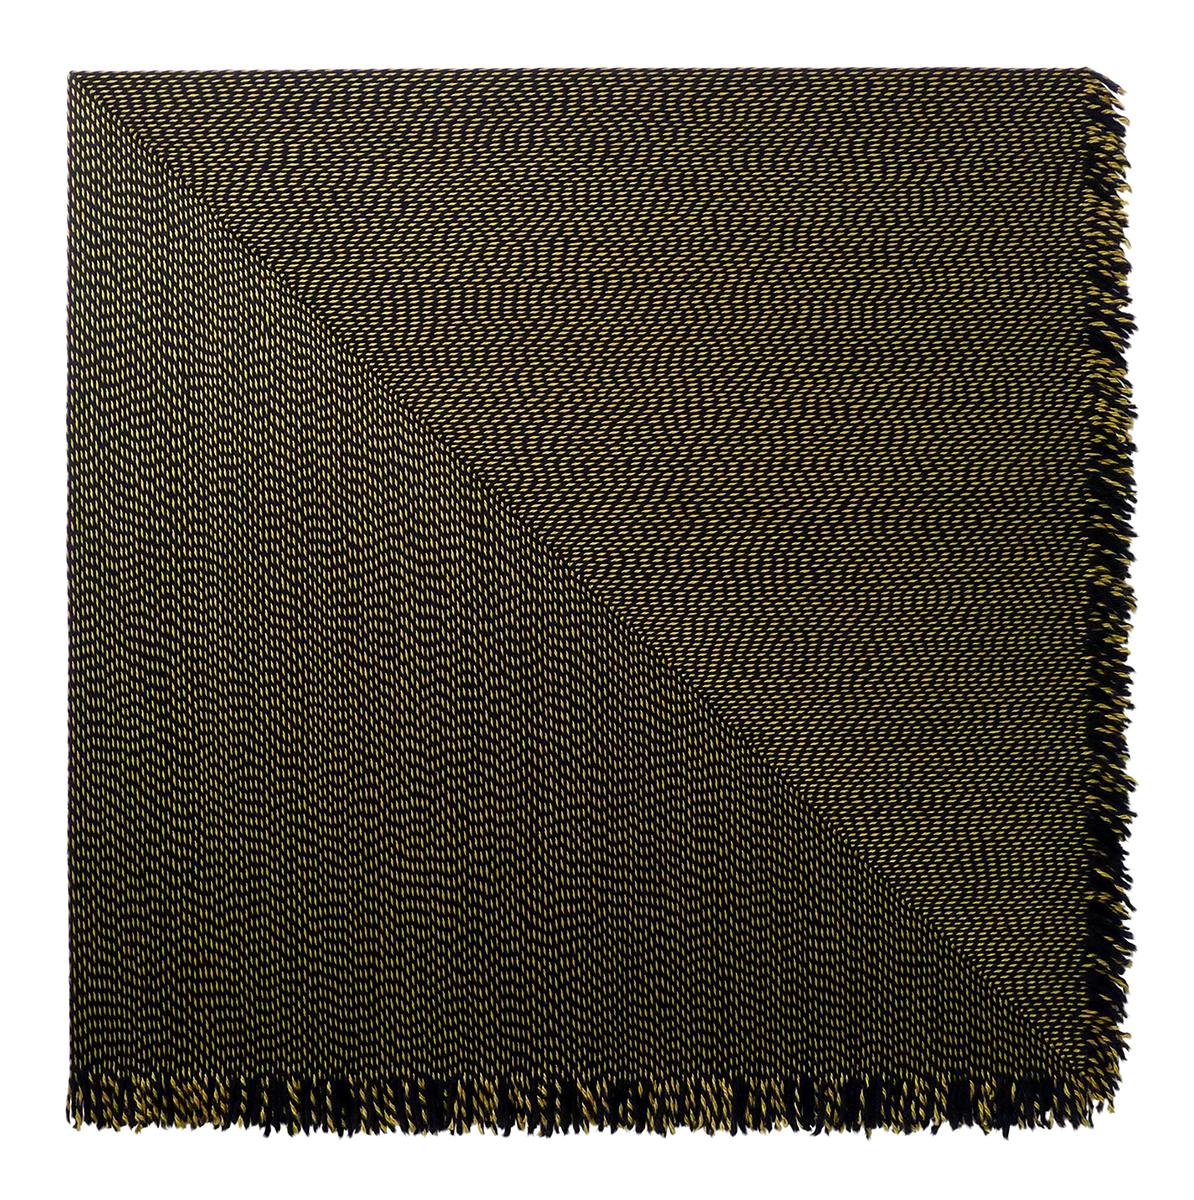 Matthew Larson, Double Fiction, 2018, Yarn, velcro, & linen on panel, 50 x 50 inches.jpg